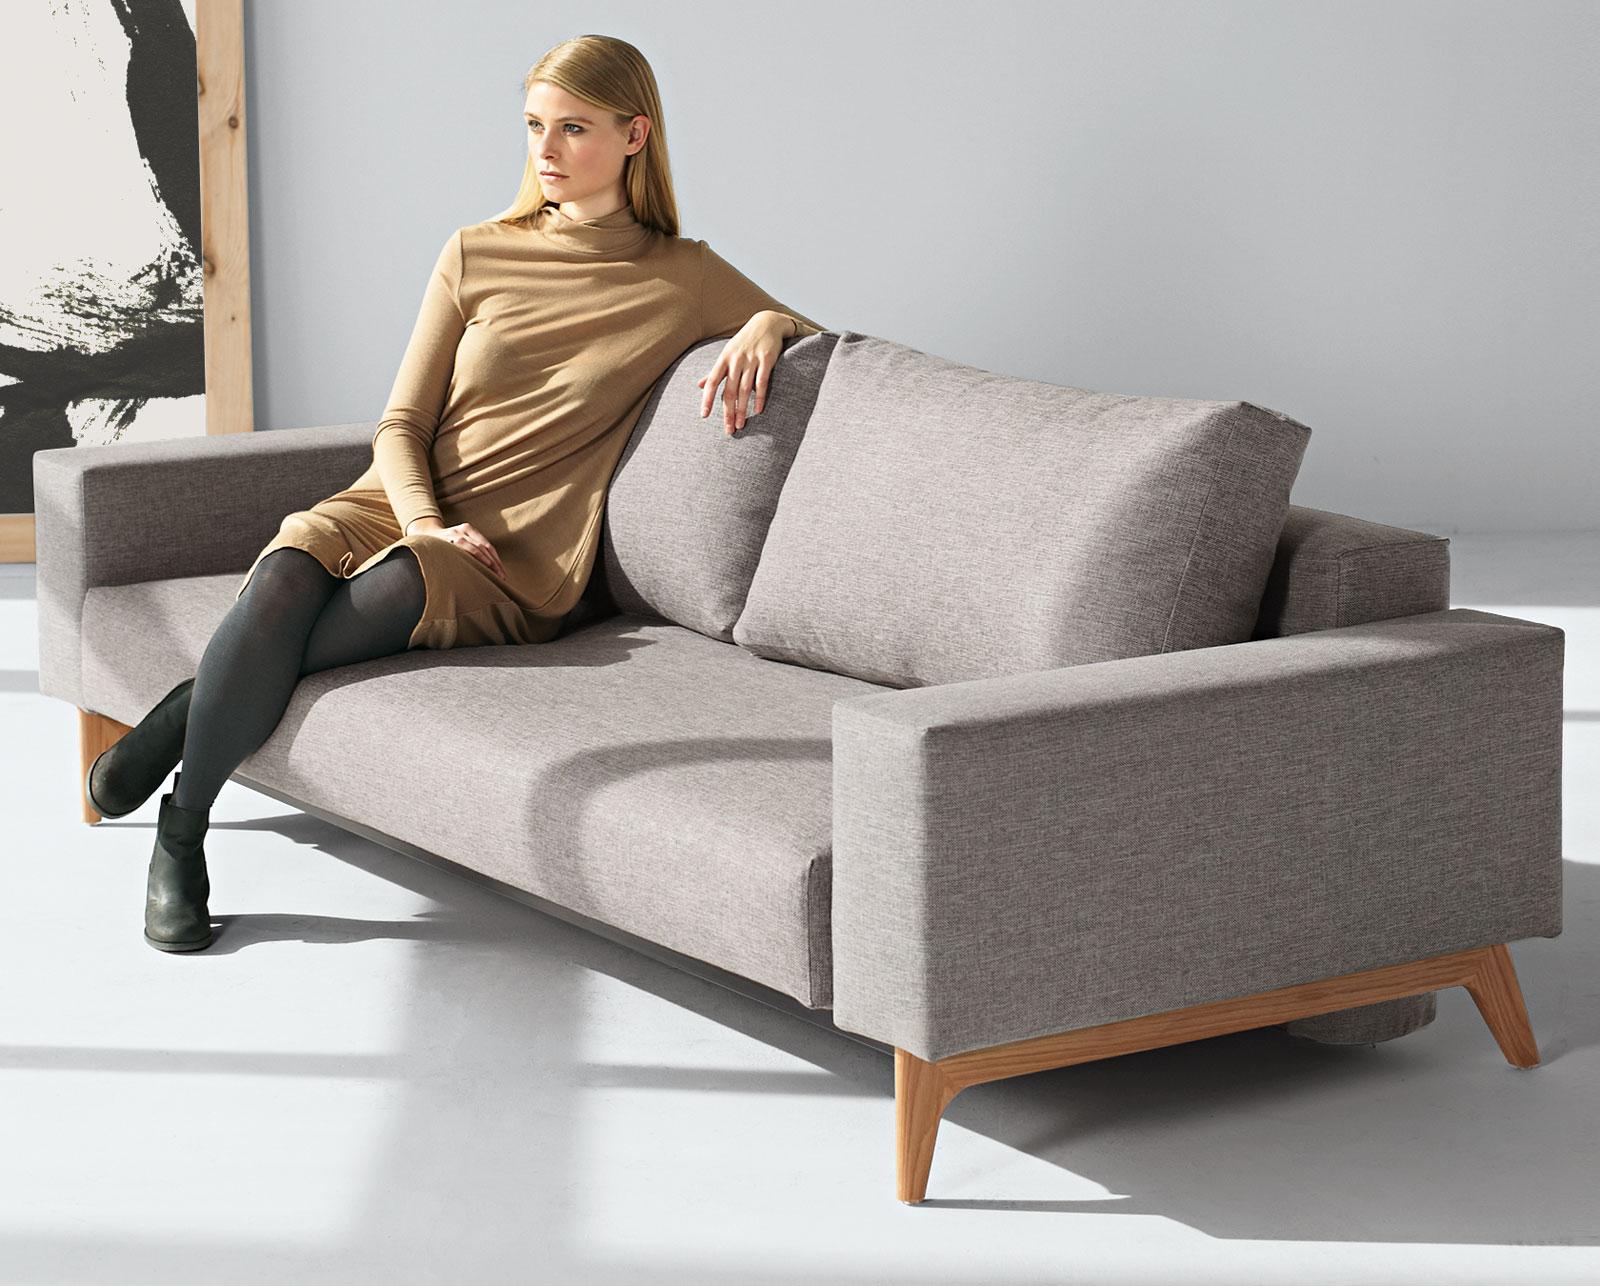 schlafsofa mit bettkasten designer design. Black Bedroom Furniture Sets. Home Design Ideas